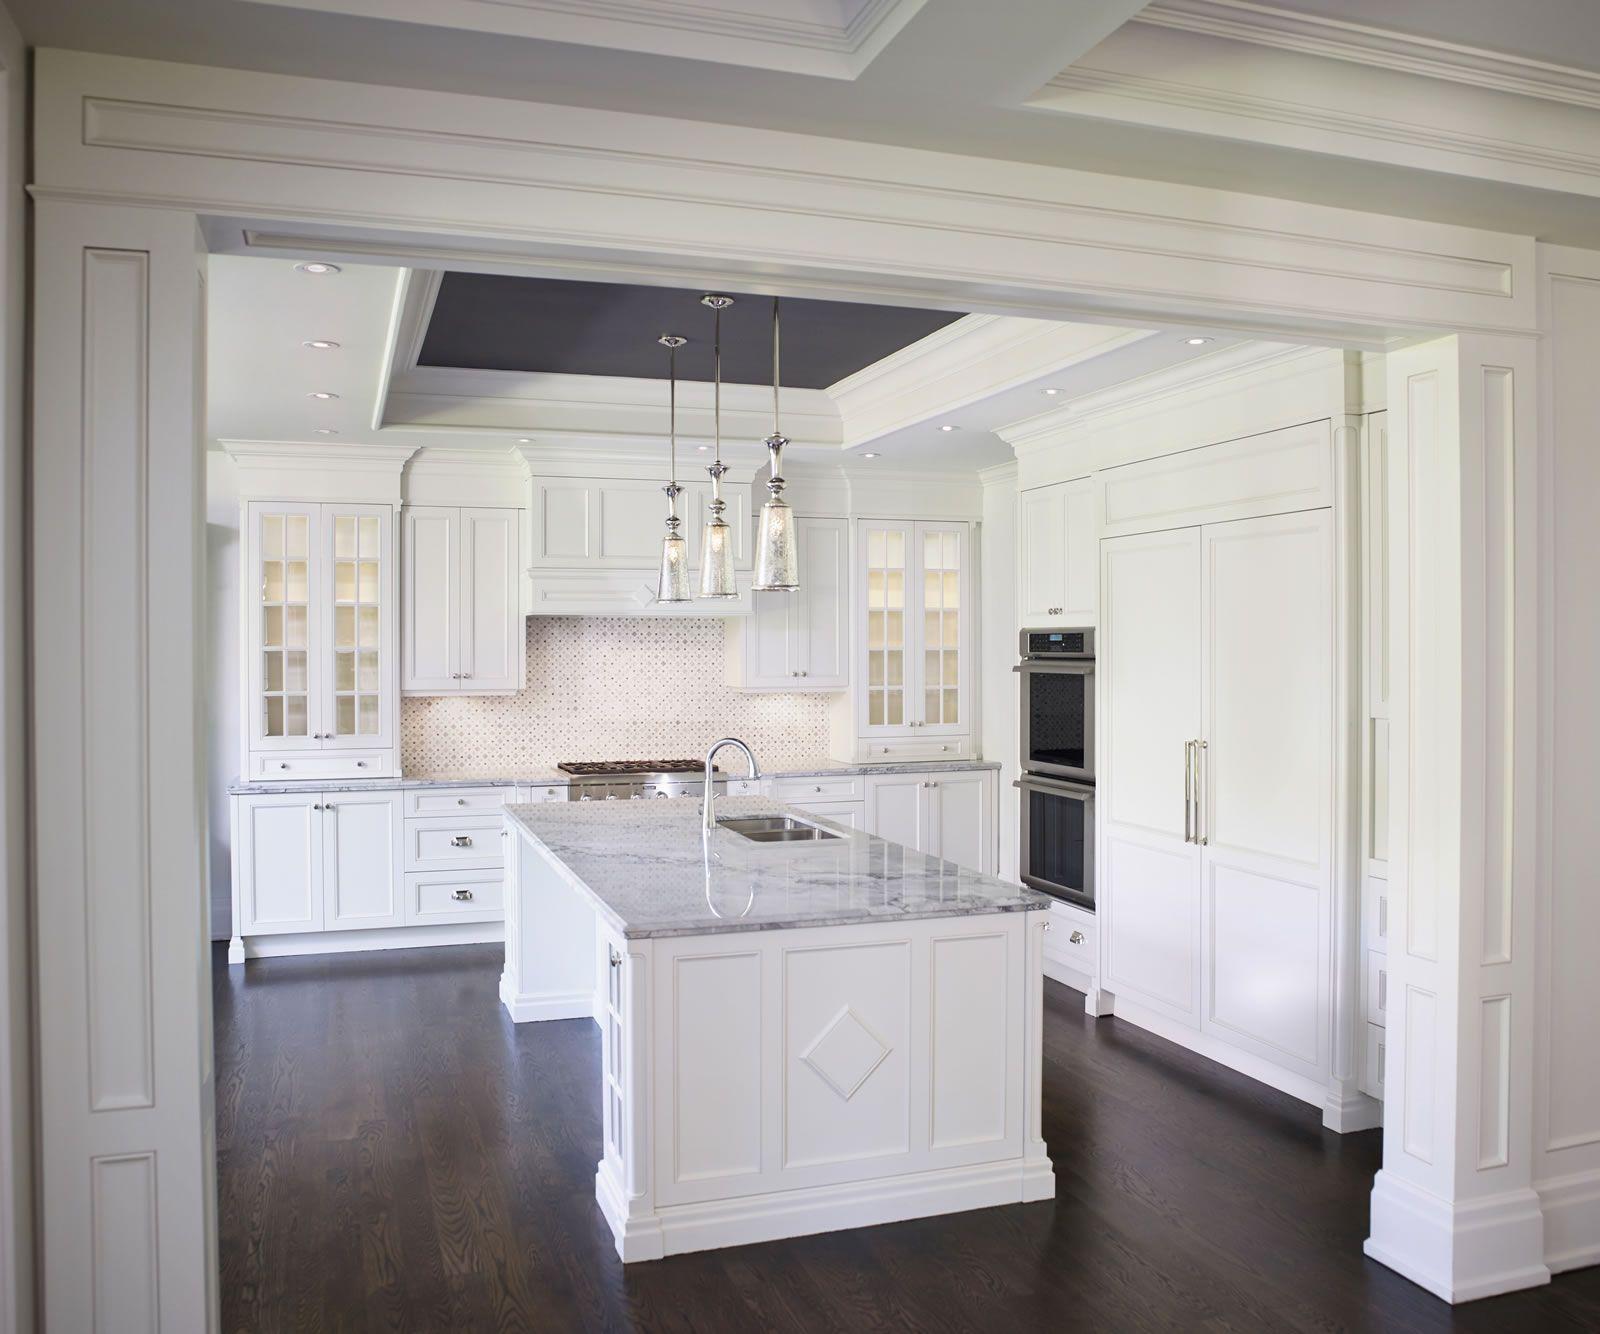 Interior designer home oakville - Oakville Interior Design Project Beyond The Blueprint Regina Sturrock Design